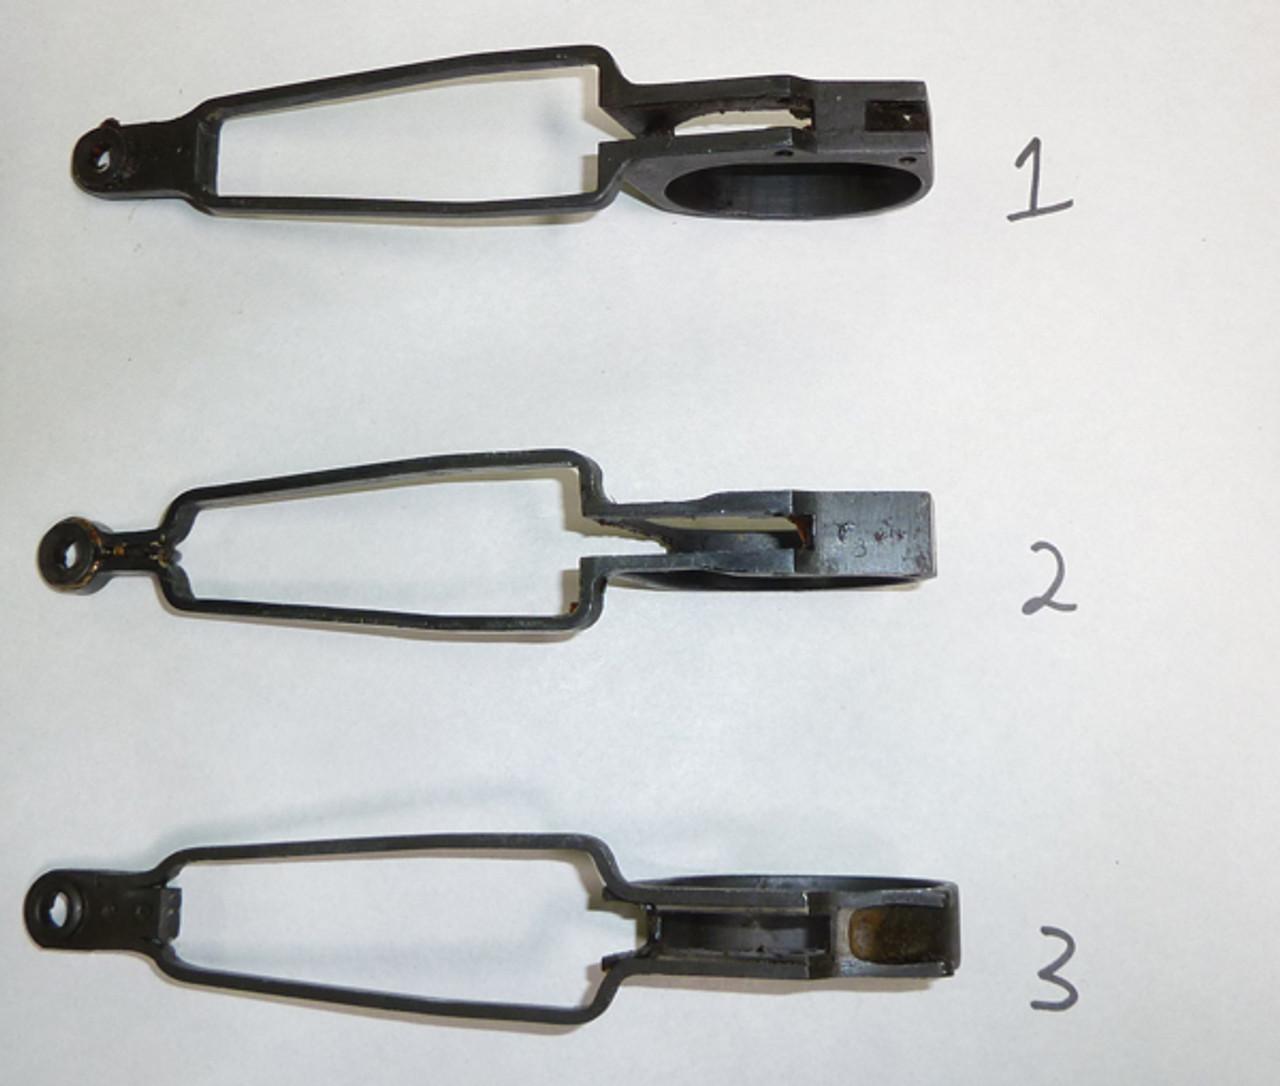 17 - No4 Mk1, Trigger Guard 2nd variation (sheet metal)